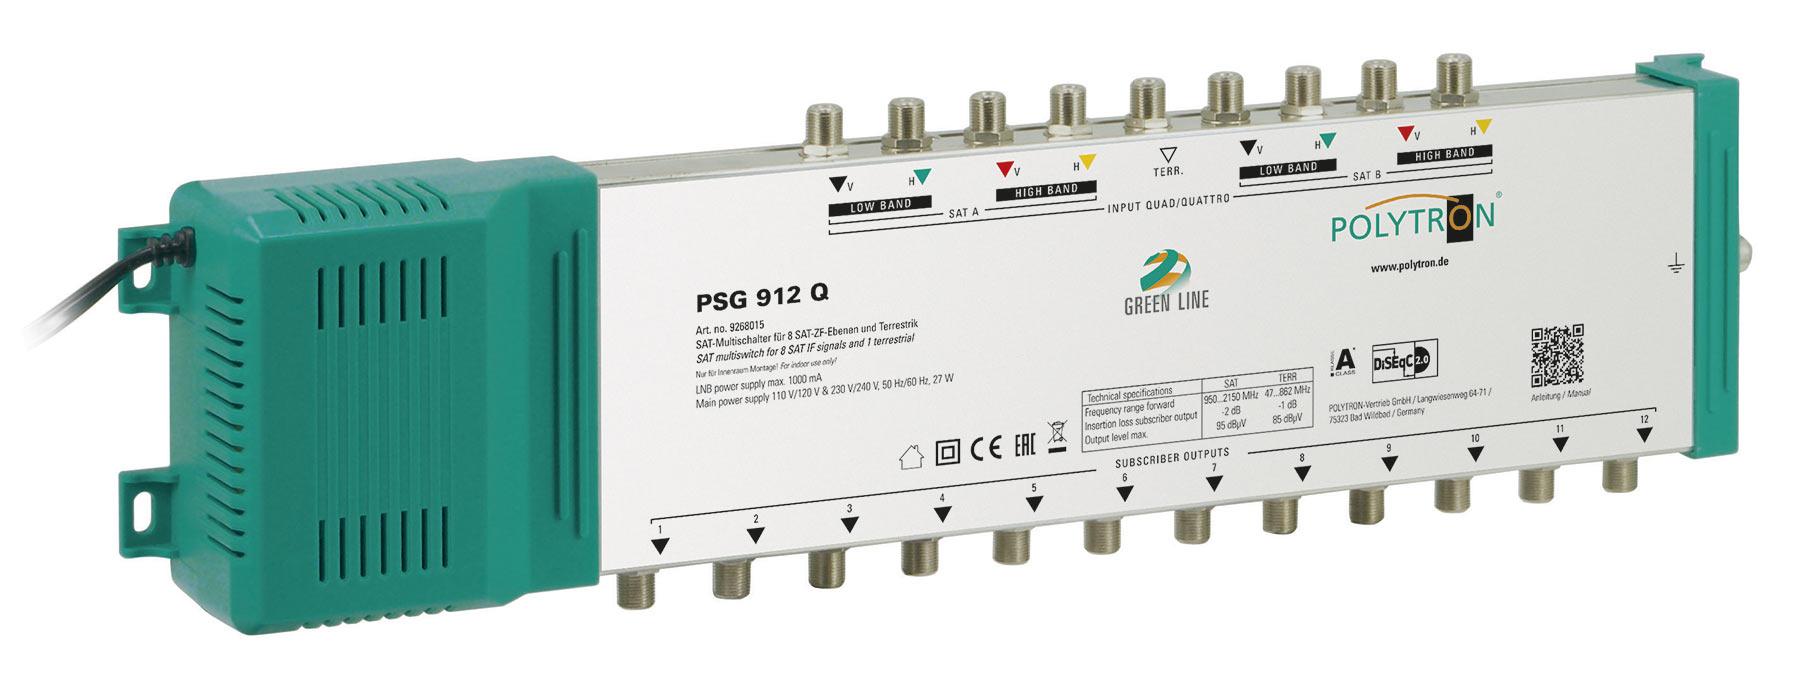 PSG 912Q Πολυδιακόπτης 9/12 ACTIVE (2 Δορυφόροι+ Επίγεια-12Εξόδους)POLYTRON